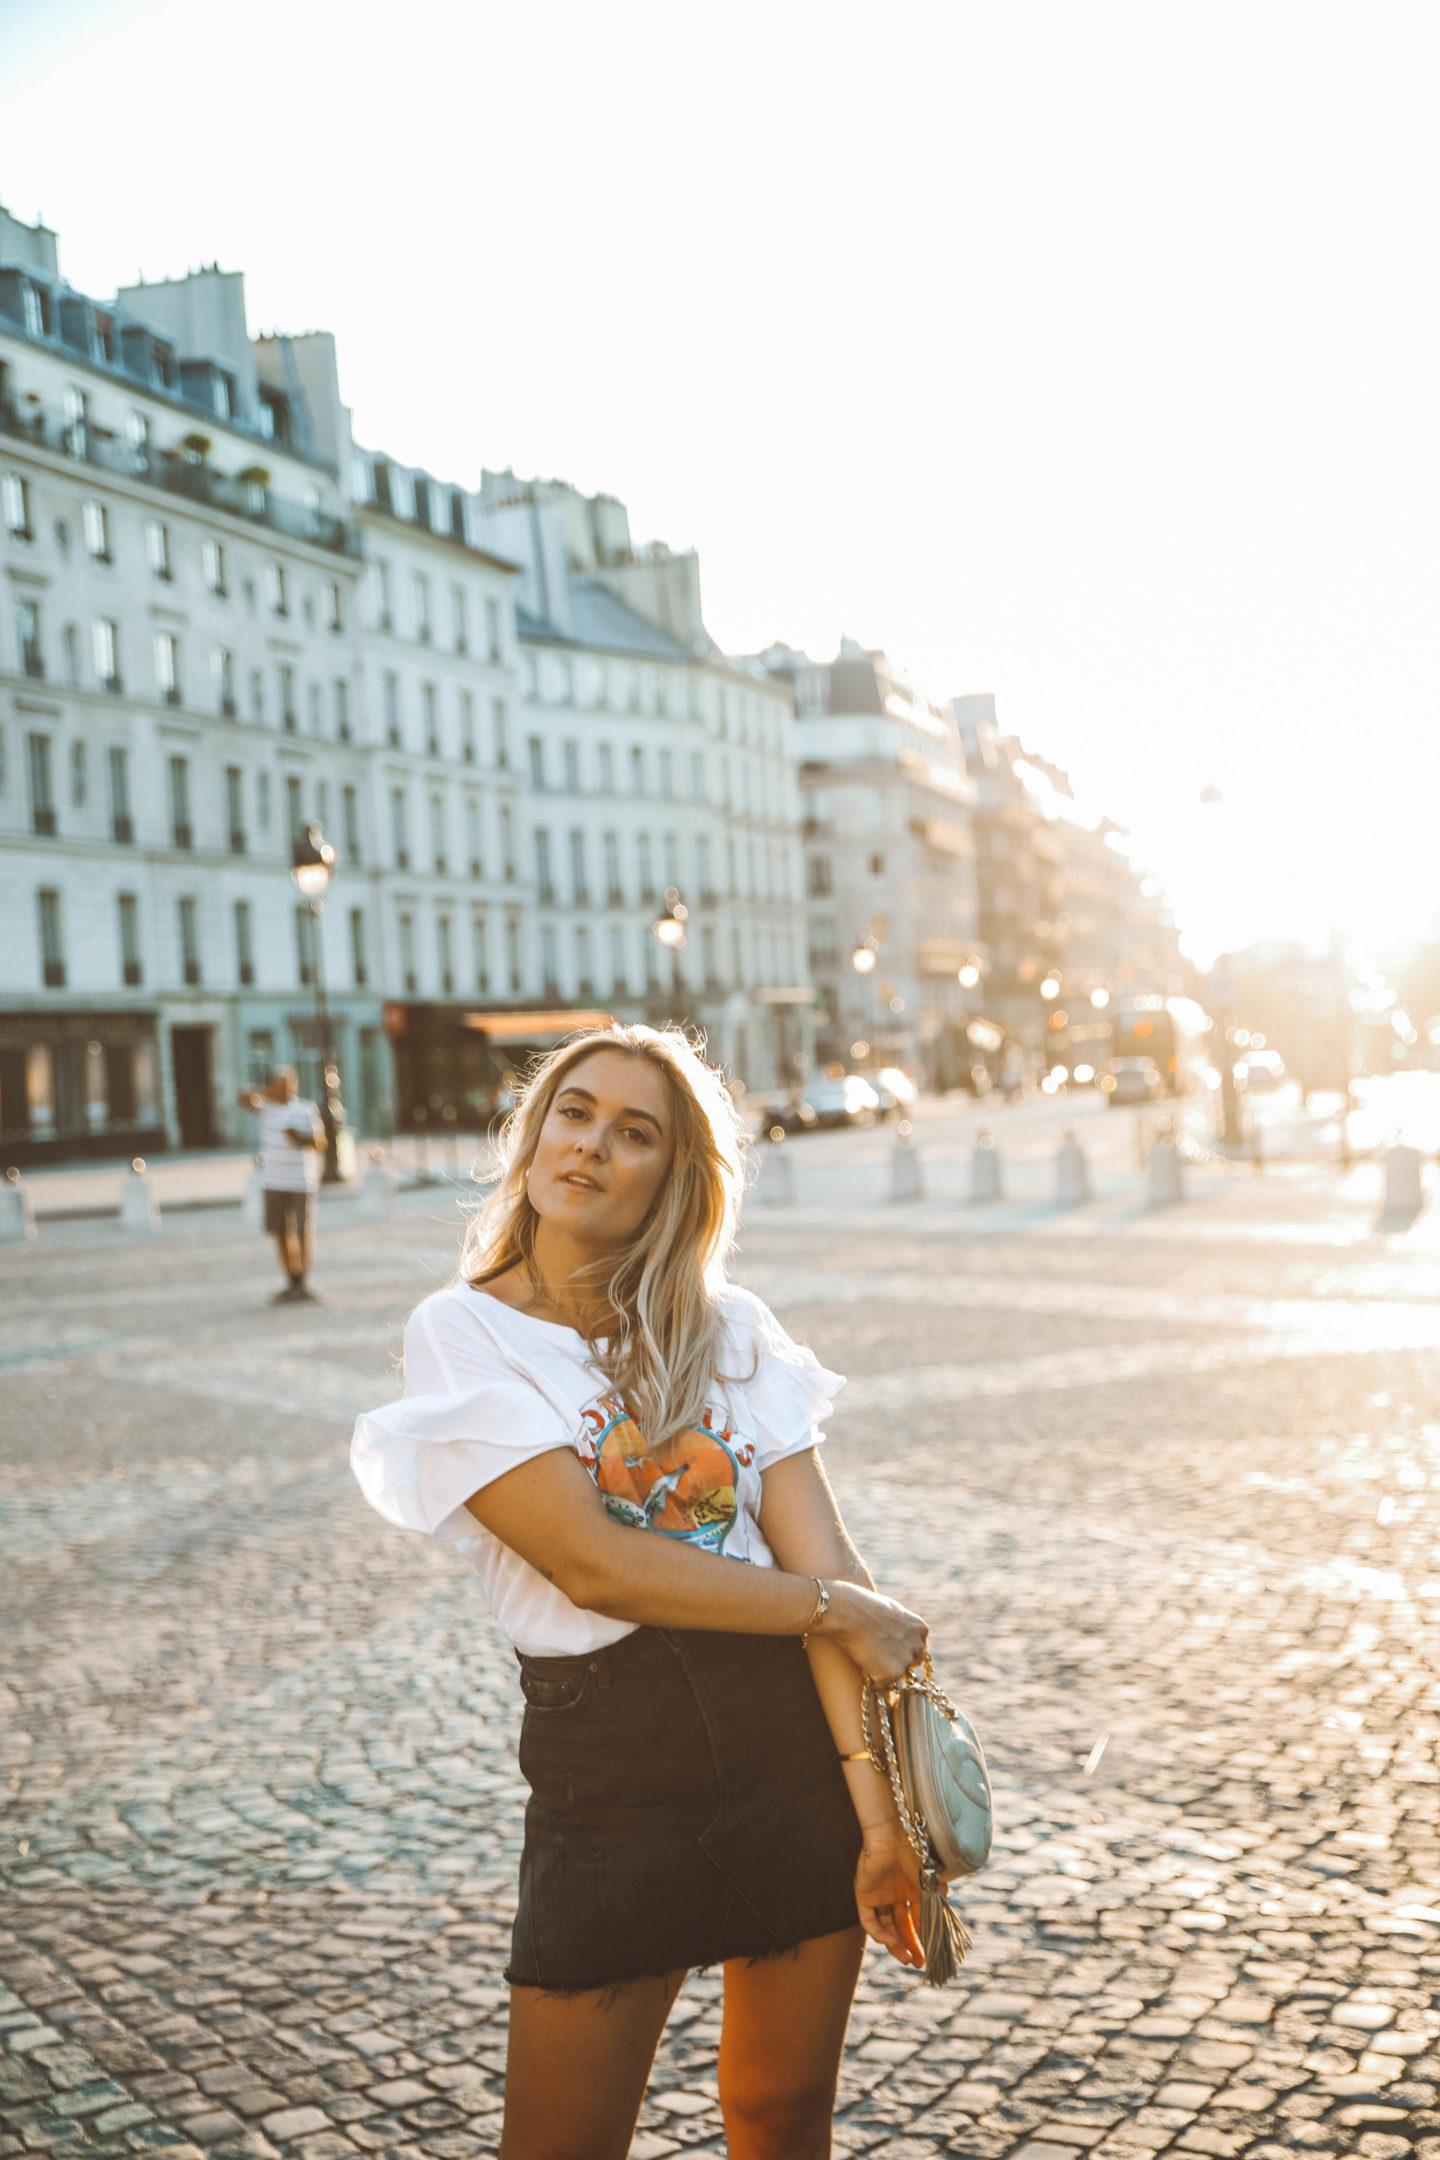 Balayage cheveux blonds - Blondie Baby blog mode Paris et voyages